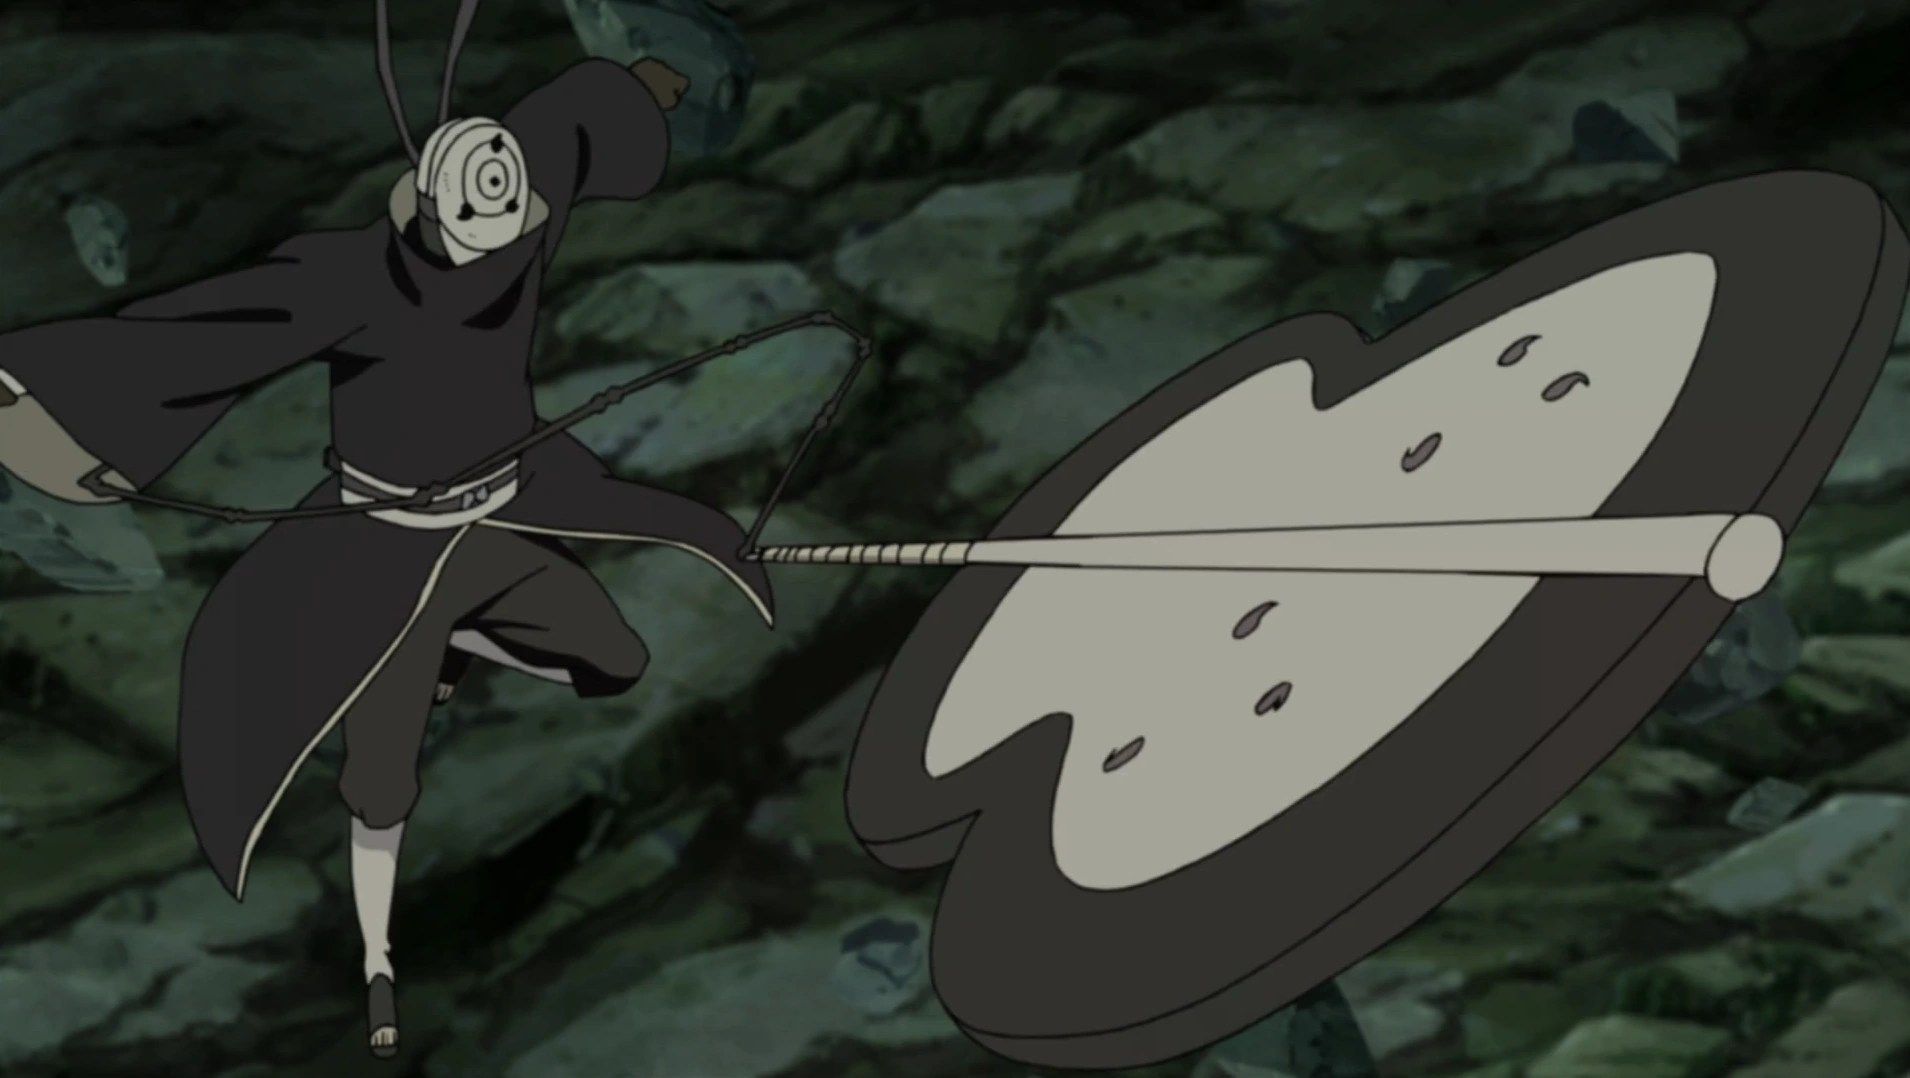 Anime Friends Wallpaper Gunbai Narutopedia Fandom Powered By Wikia